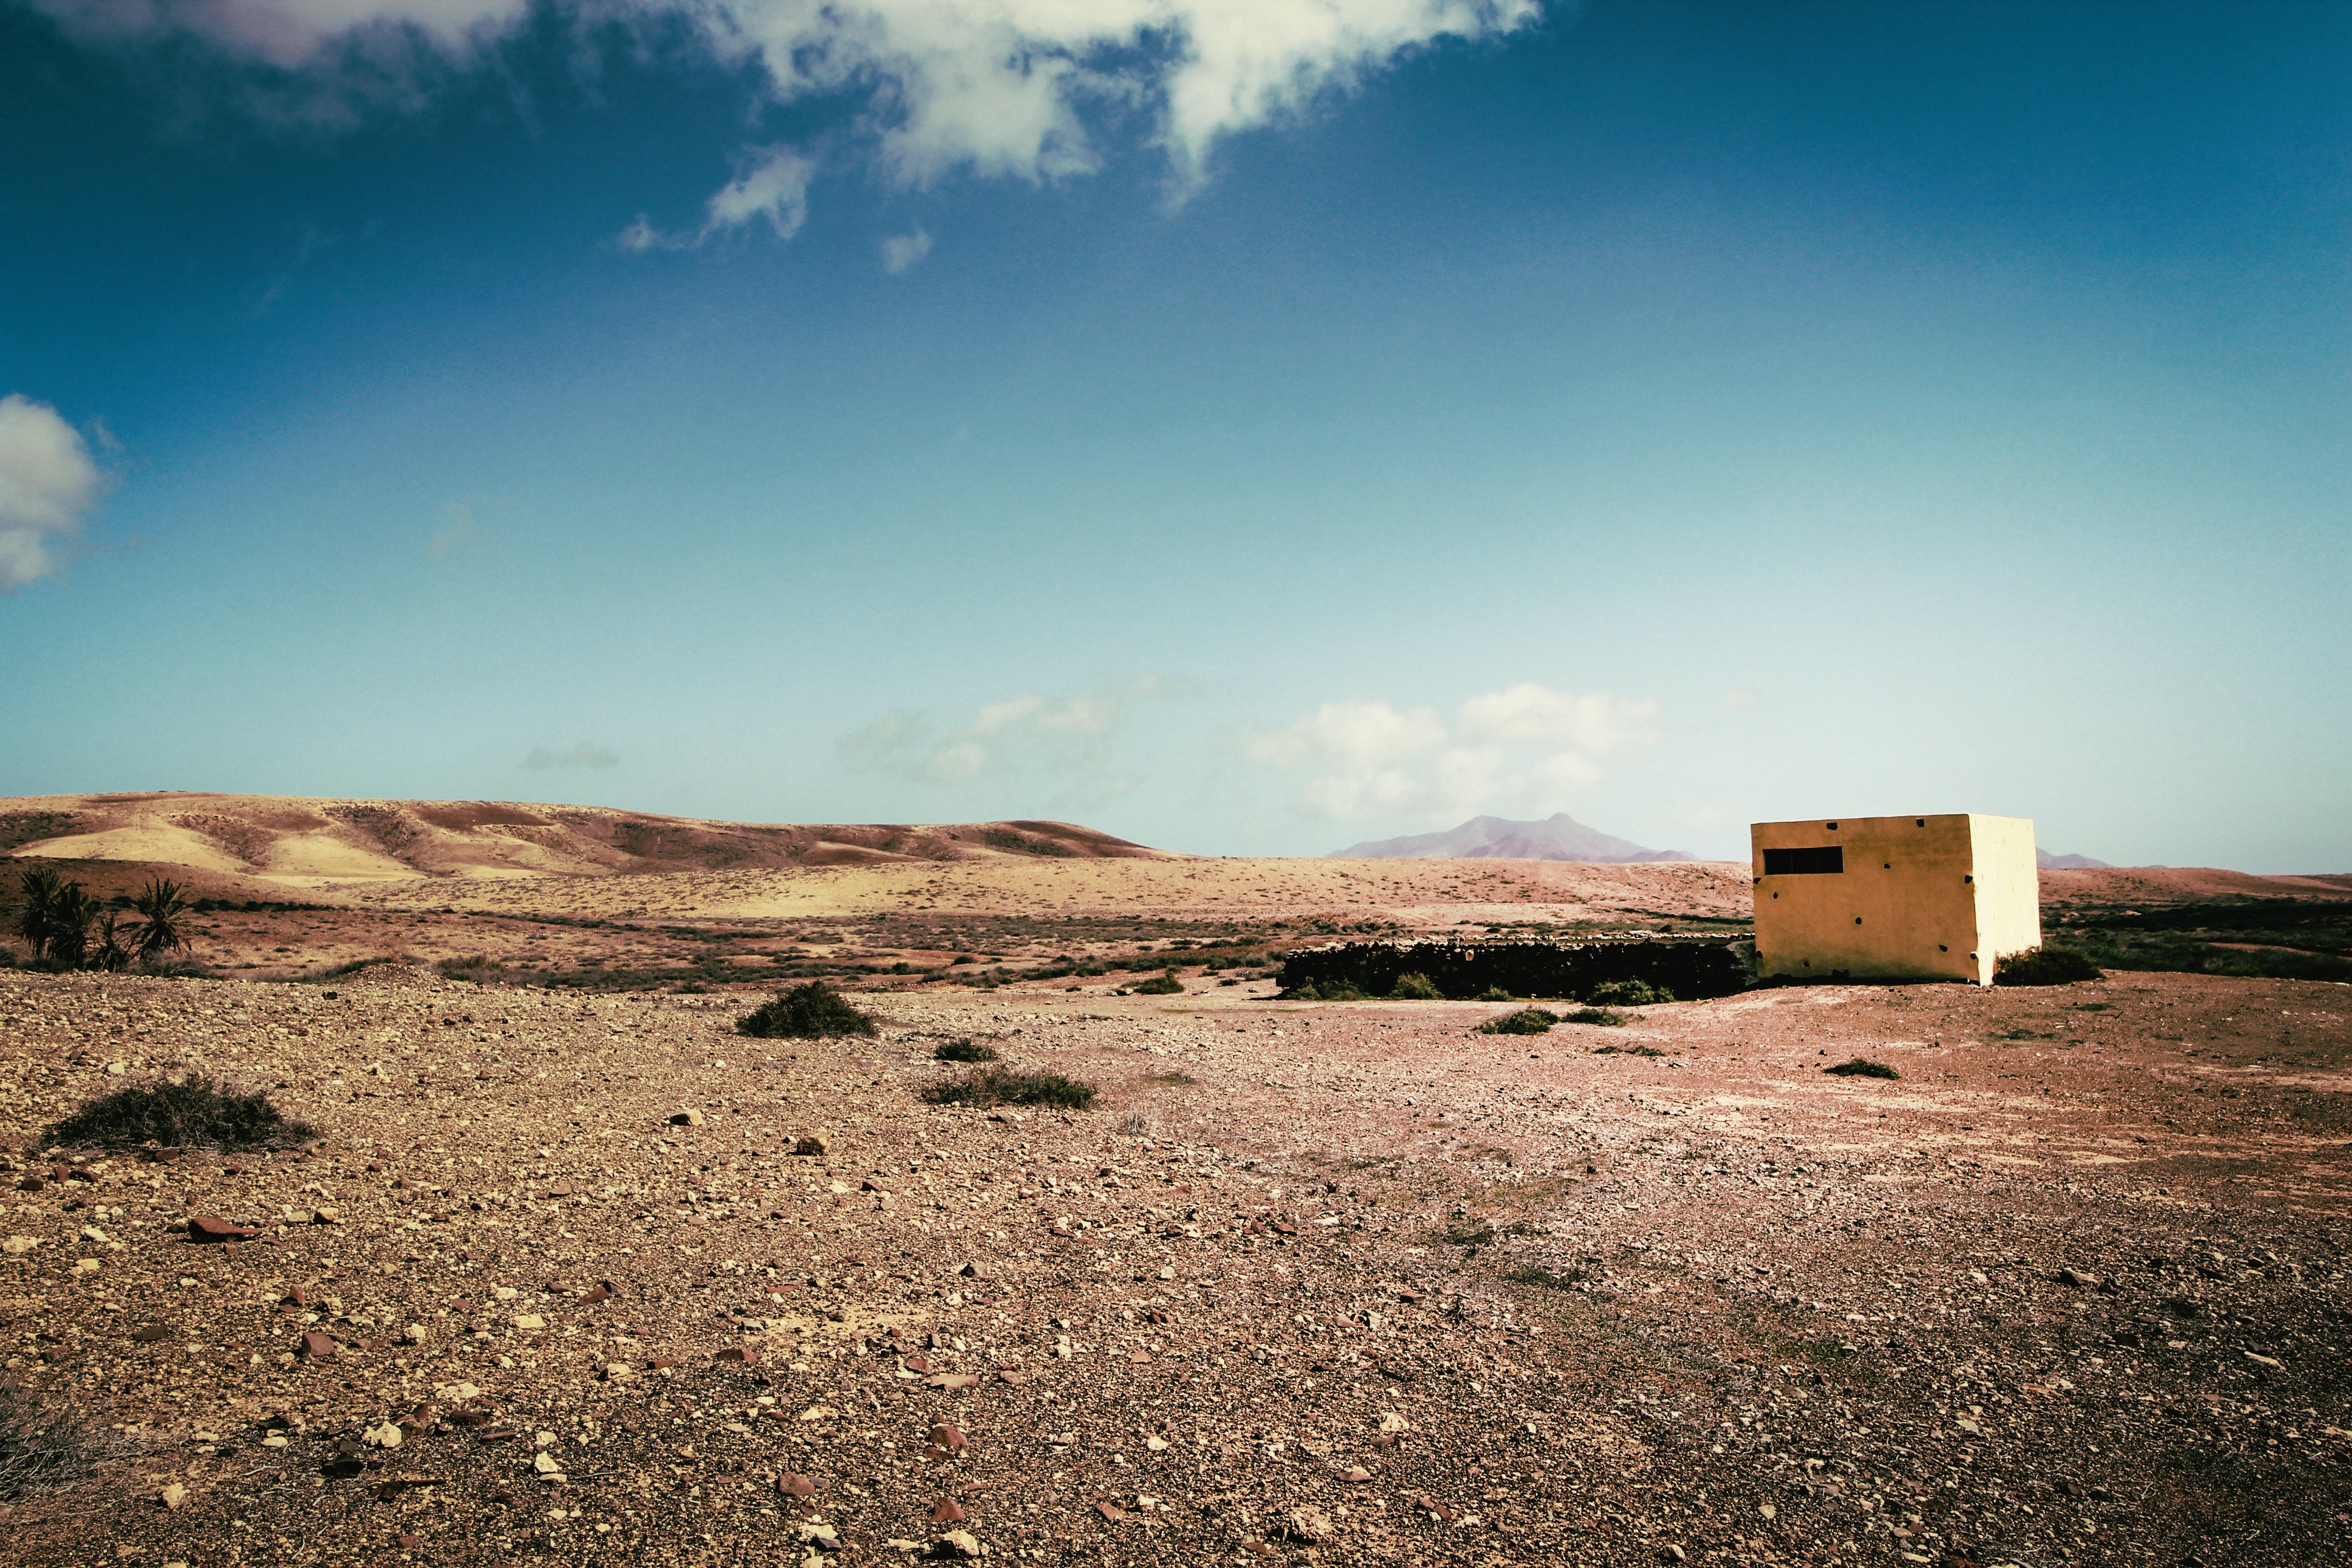 White Concrete Building on Desert, Rocks, Sand, Rock, Road, HQ Photo